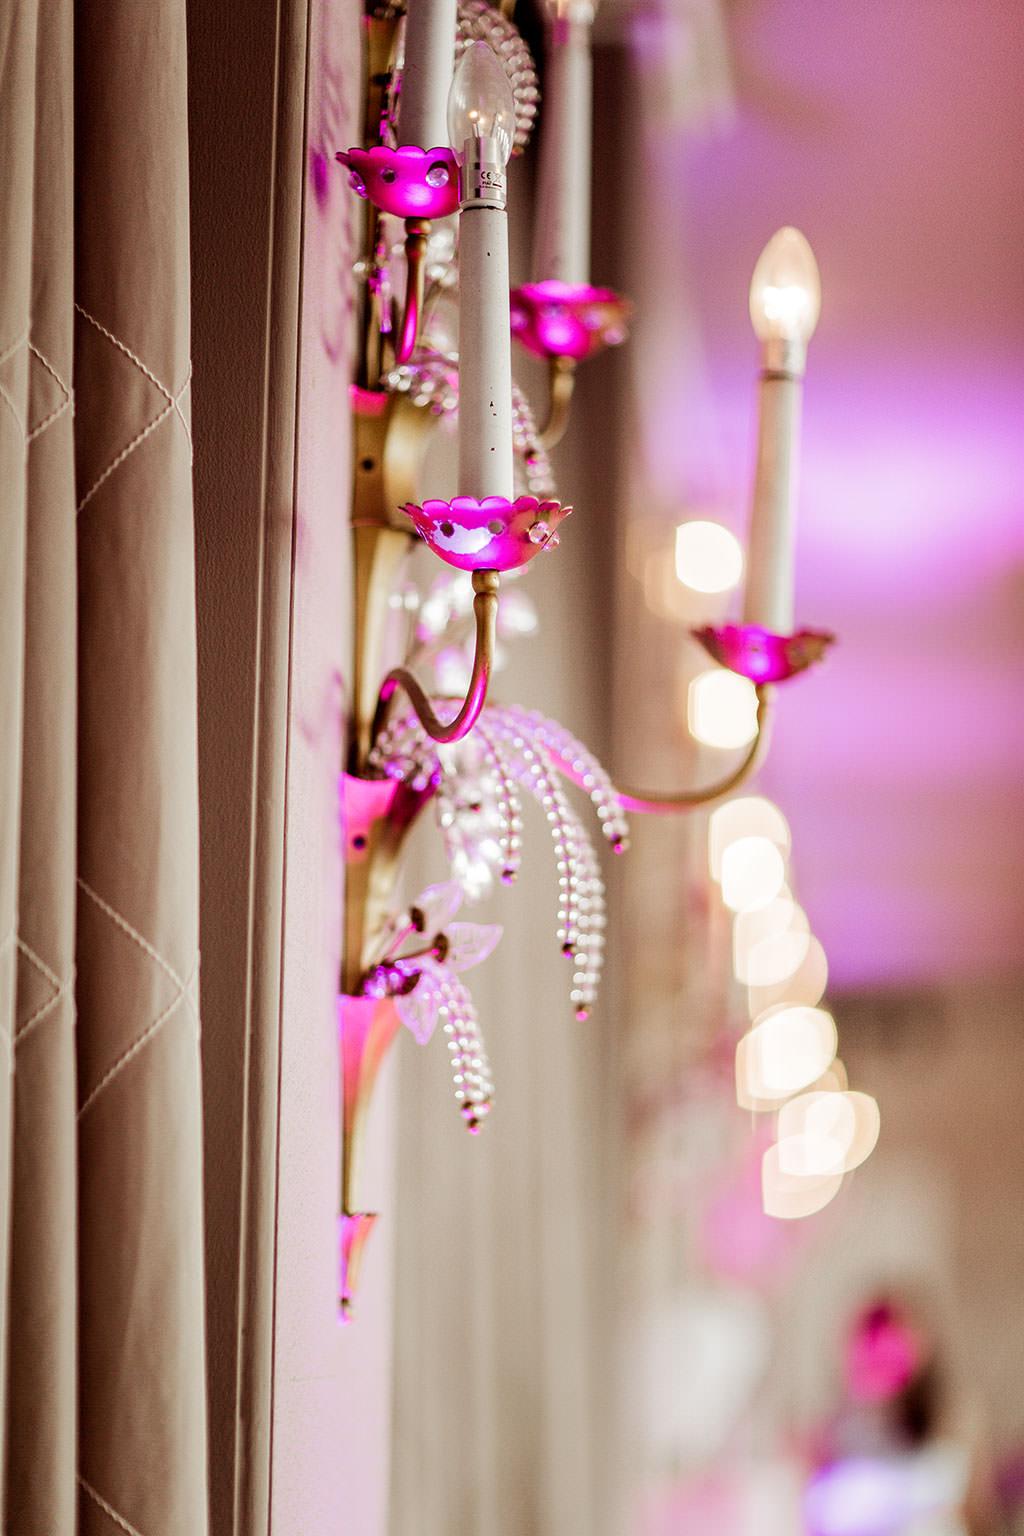 Wandlampe im Rheinsaal